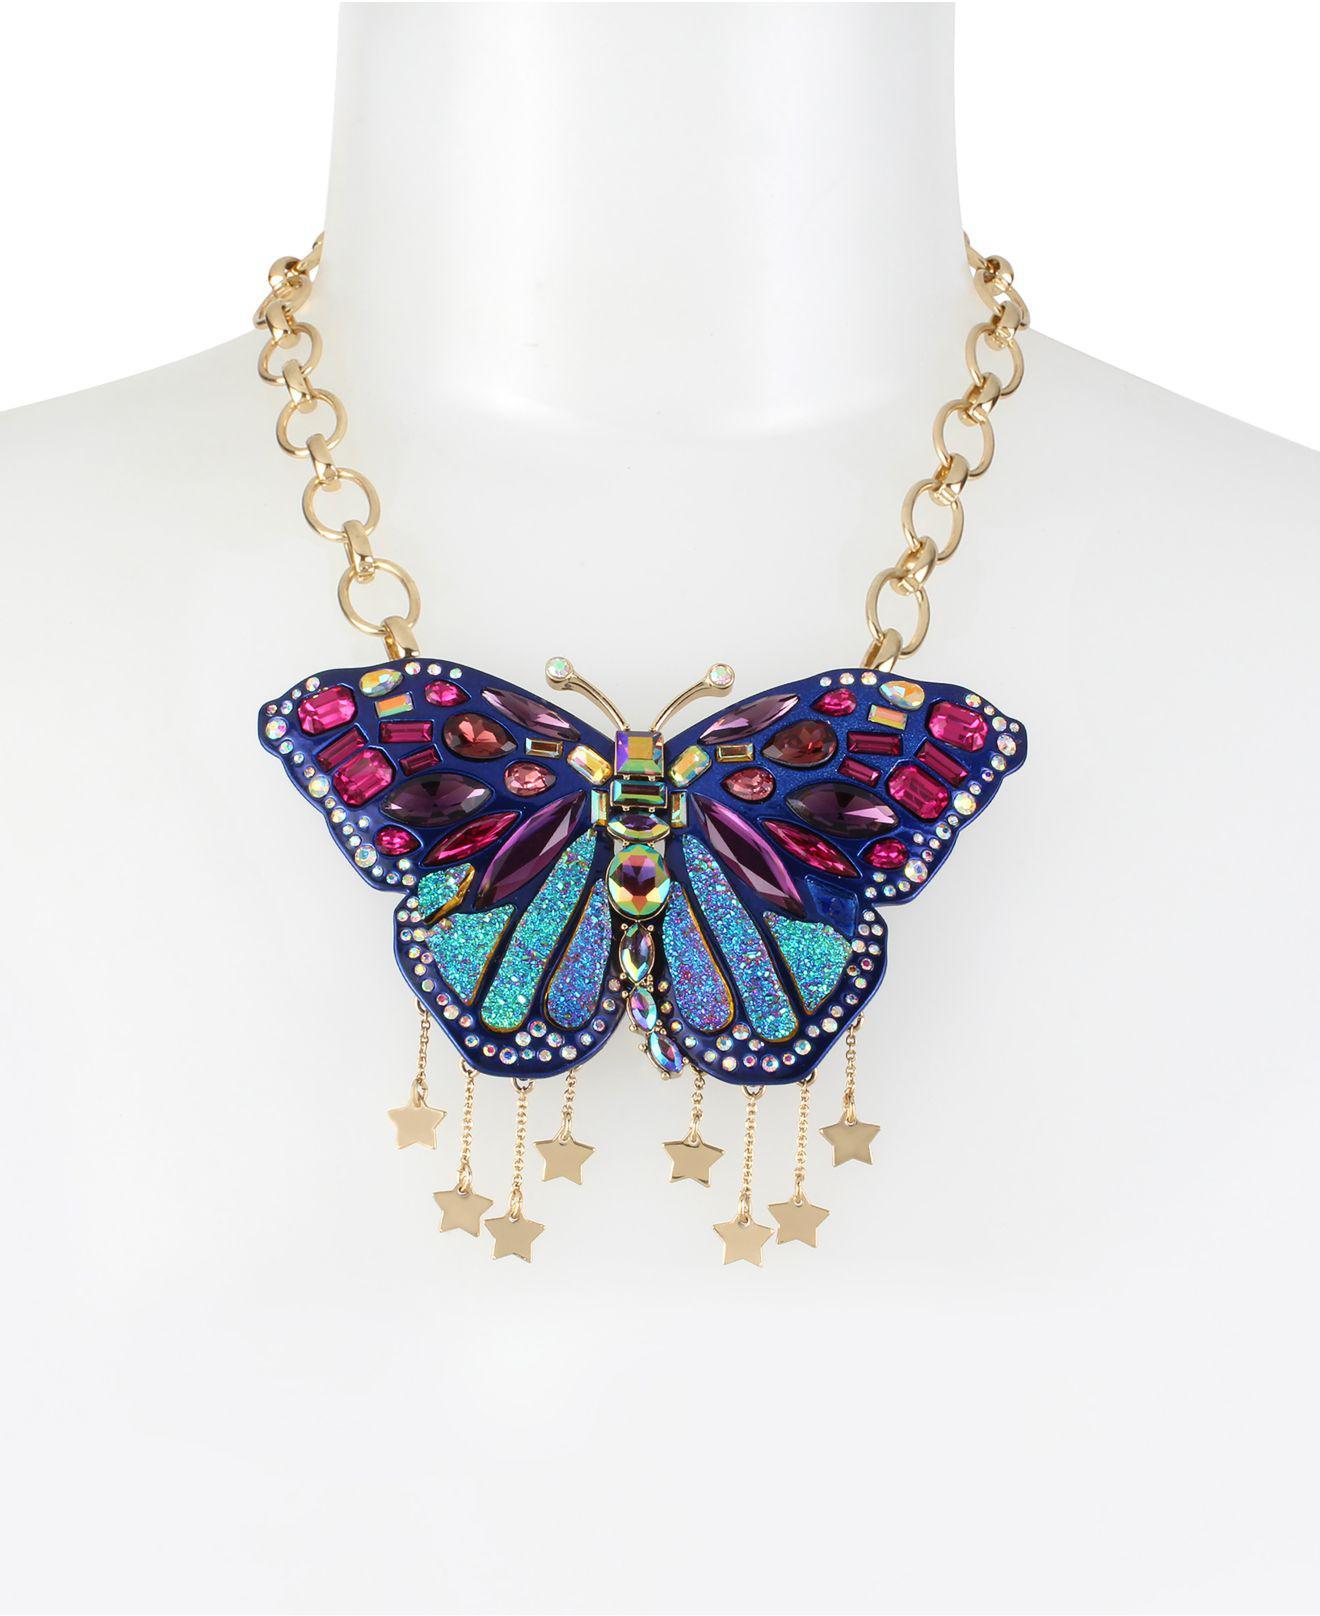 Betsey Johnson Butterfly Necklace